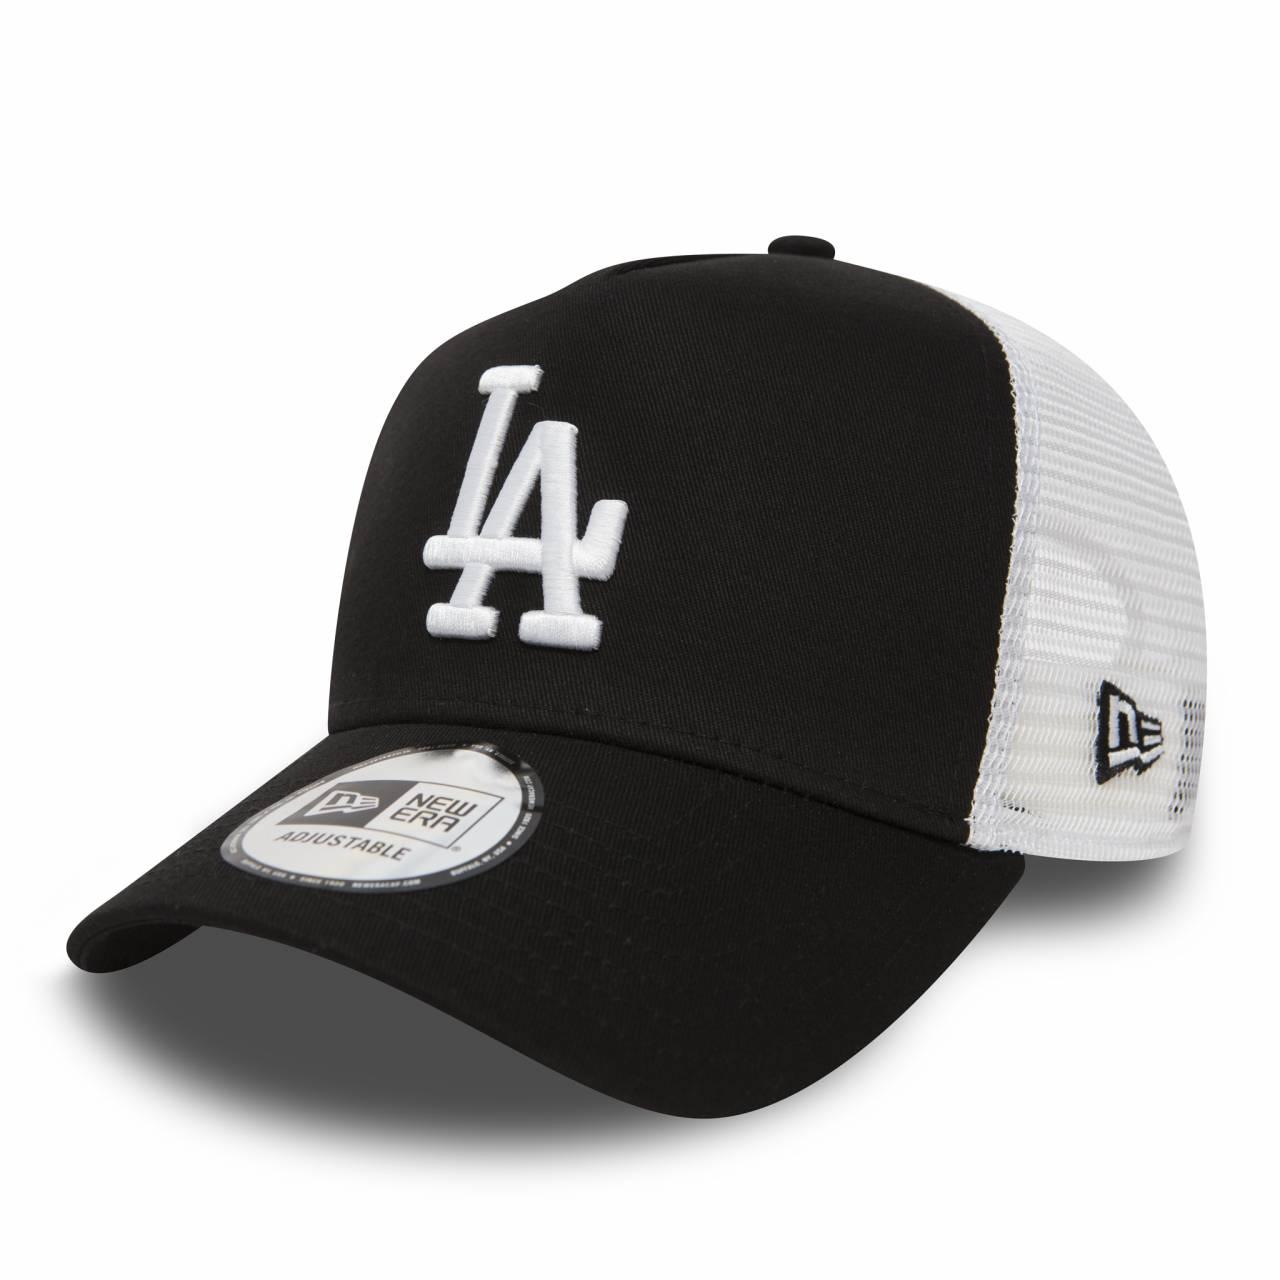 11405498 MLB TRUCKER LOS ANGELES DODGERS BLACK CAP